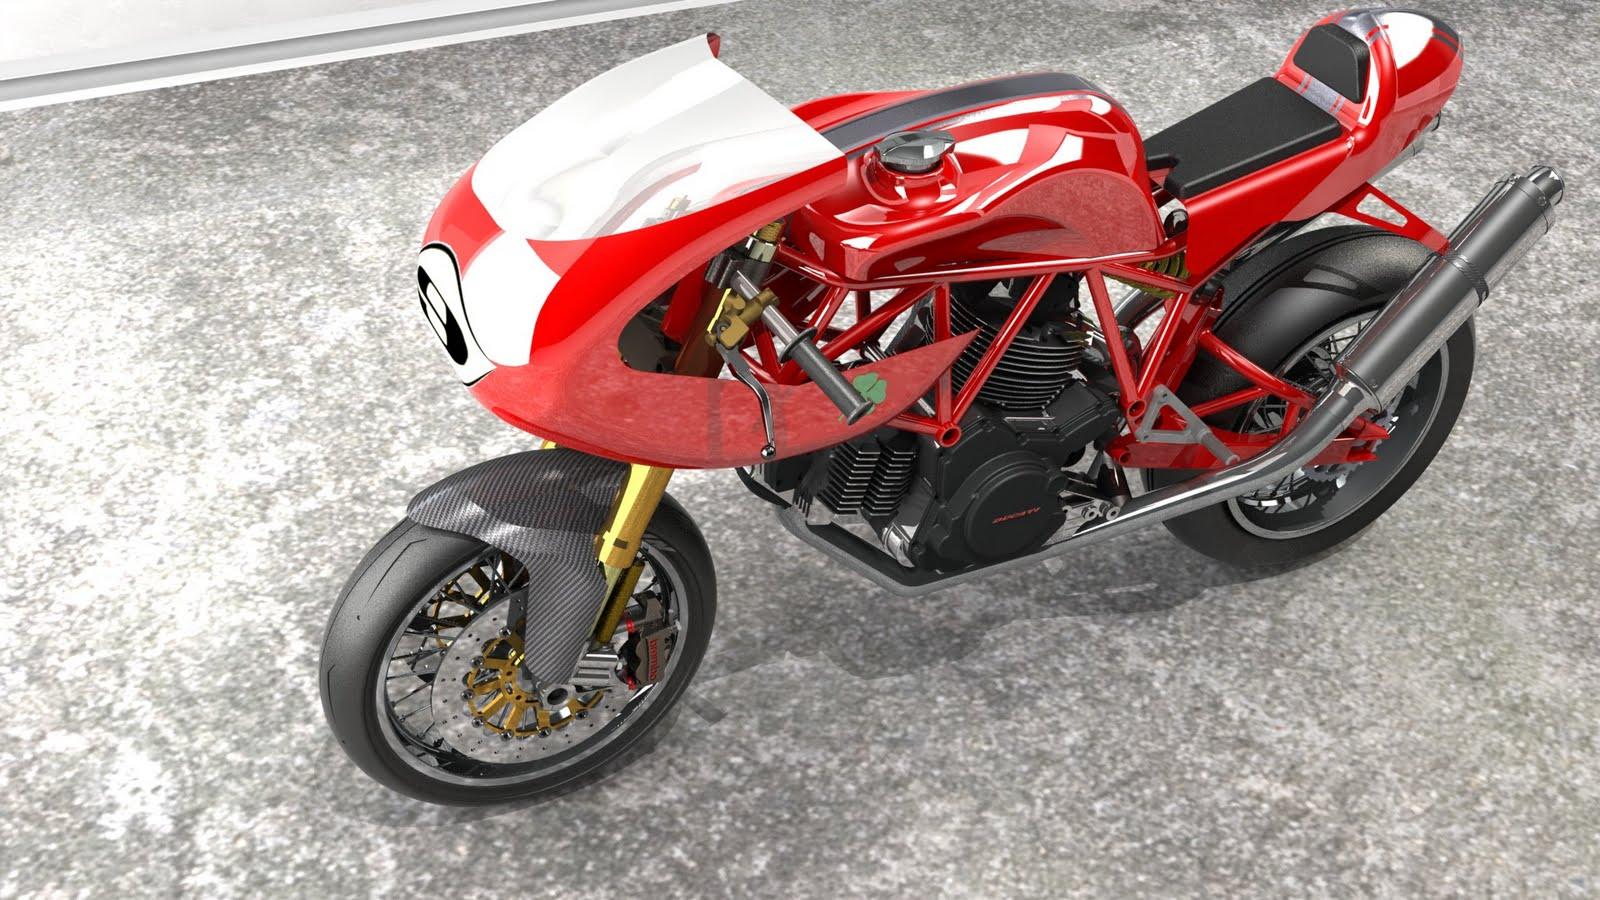 Ducati Desmo Cafe Racer